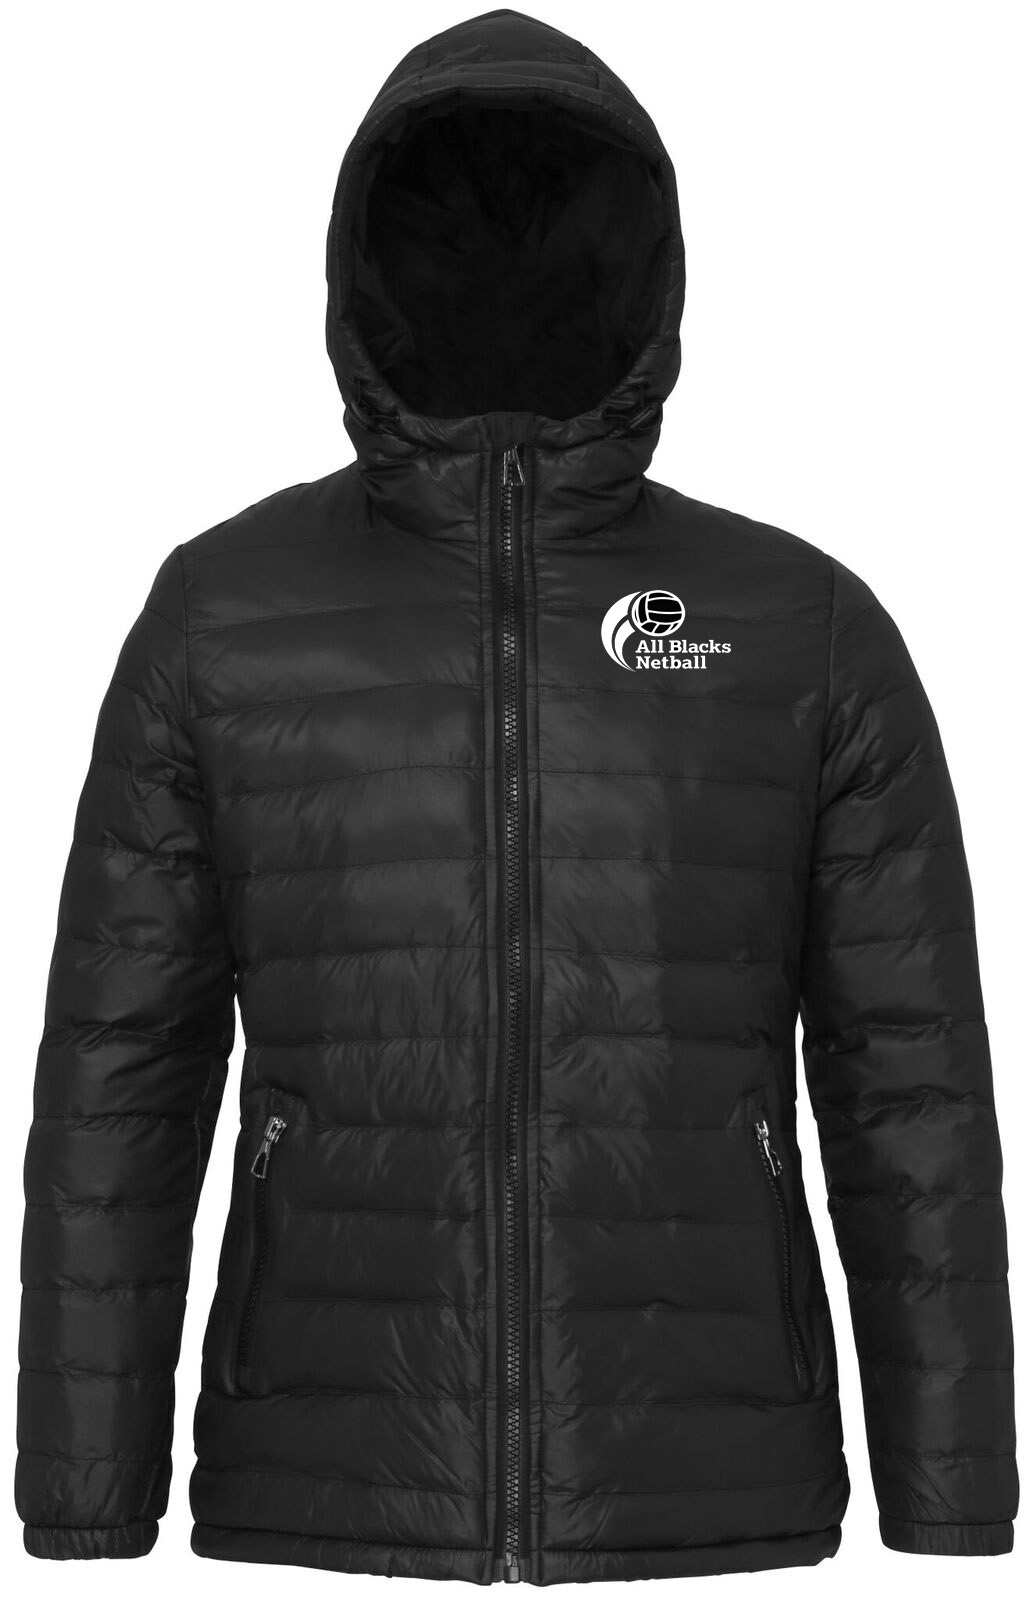 All Blacks Snowbird Jacket